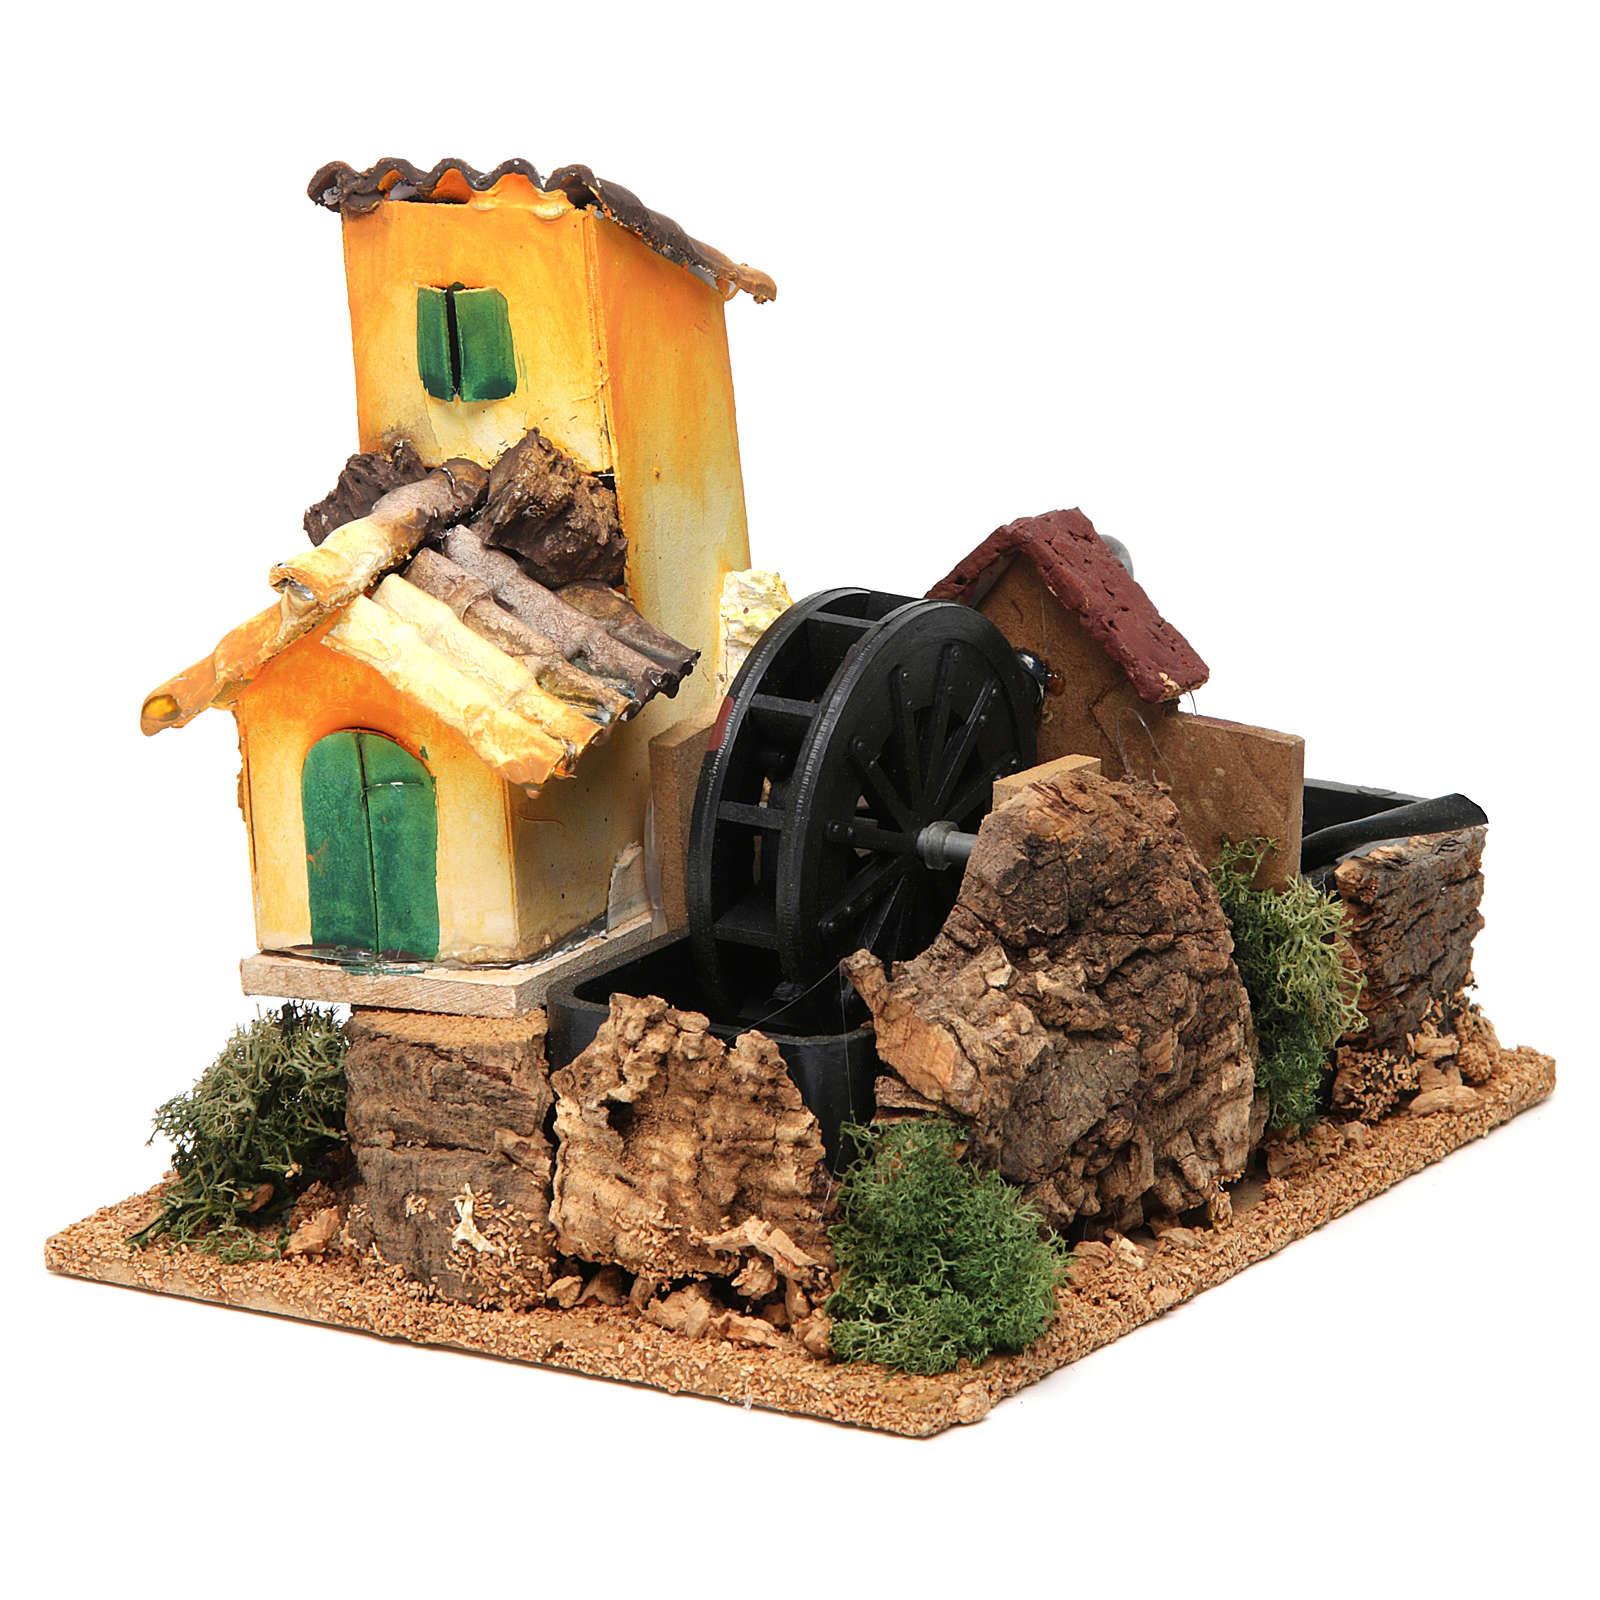 Nativity scene watermill 15x17x13 cm 4